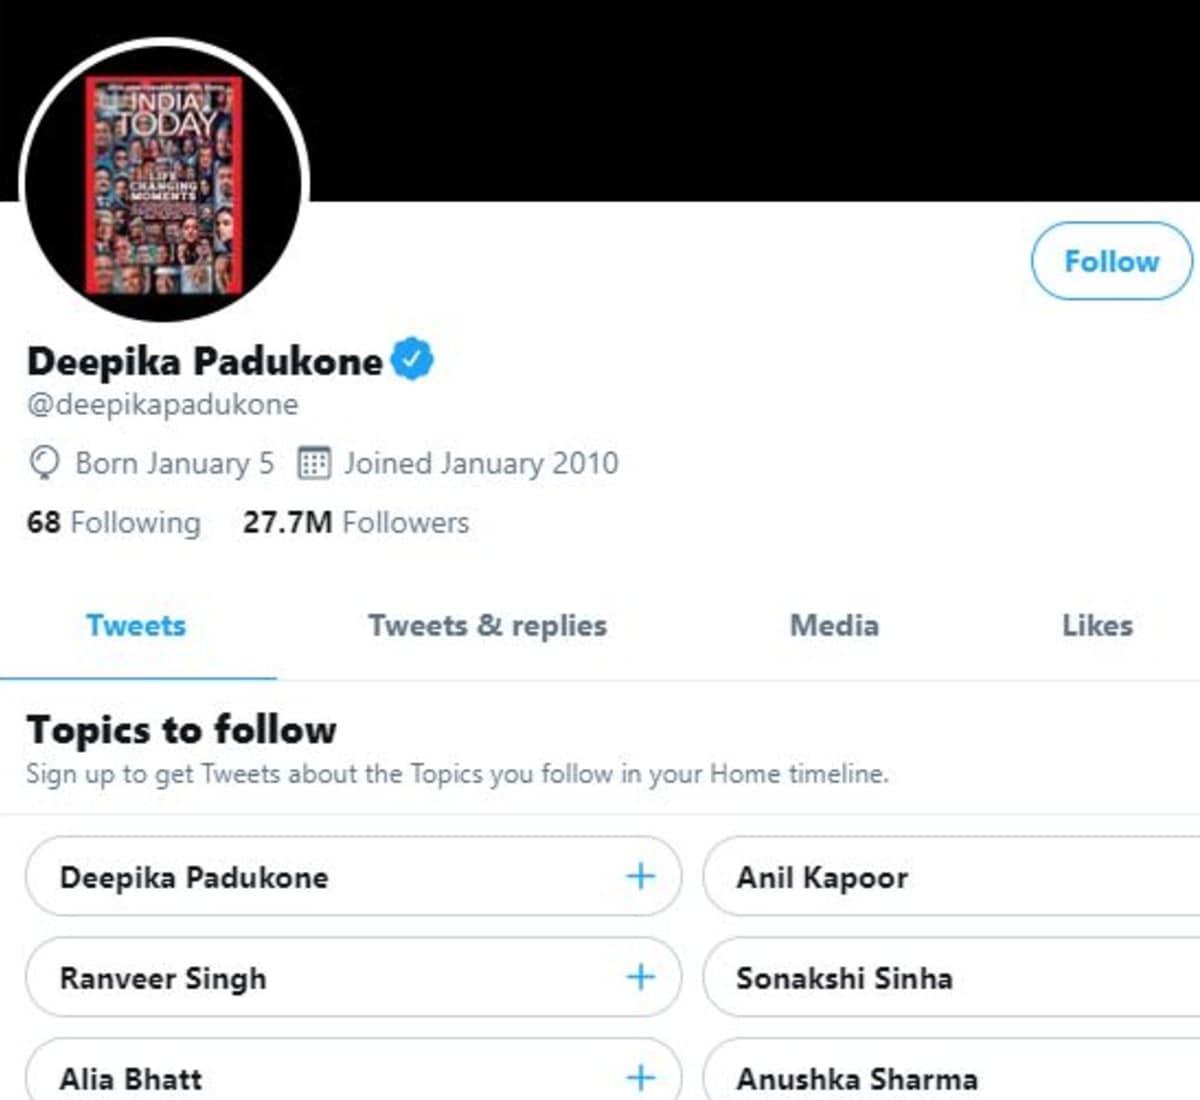 Deepika Padukone, Deepika Padukone all Social Media posts deleted , Facebook, Twitter, Instagram, Bollywood, News 18, Network 18, Viral posts, दीपिका पादुकोण , दीपिका पादुकोण ने डिलीट किए सारे पोस्ट,  फेसबुक, ट्विटर, इंस्टाग्राम, बॉलीवुड, न्यूज18, नेटवर्क 18, वायरल पोस्ट